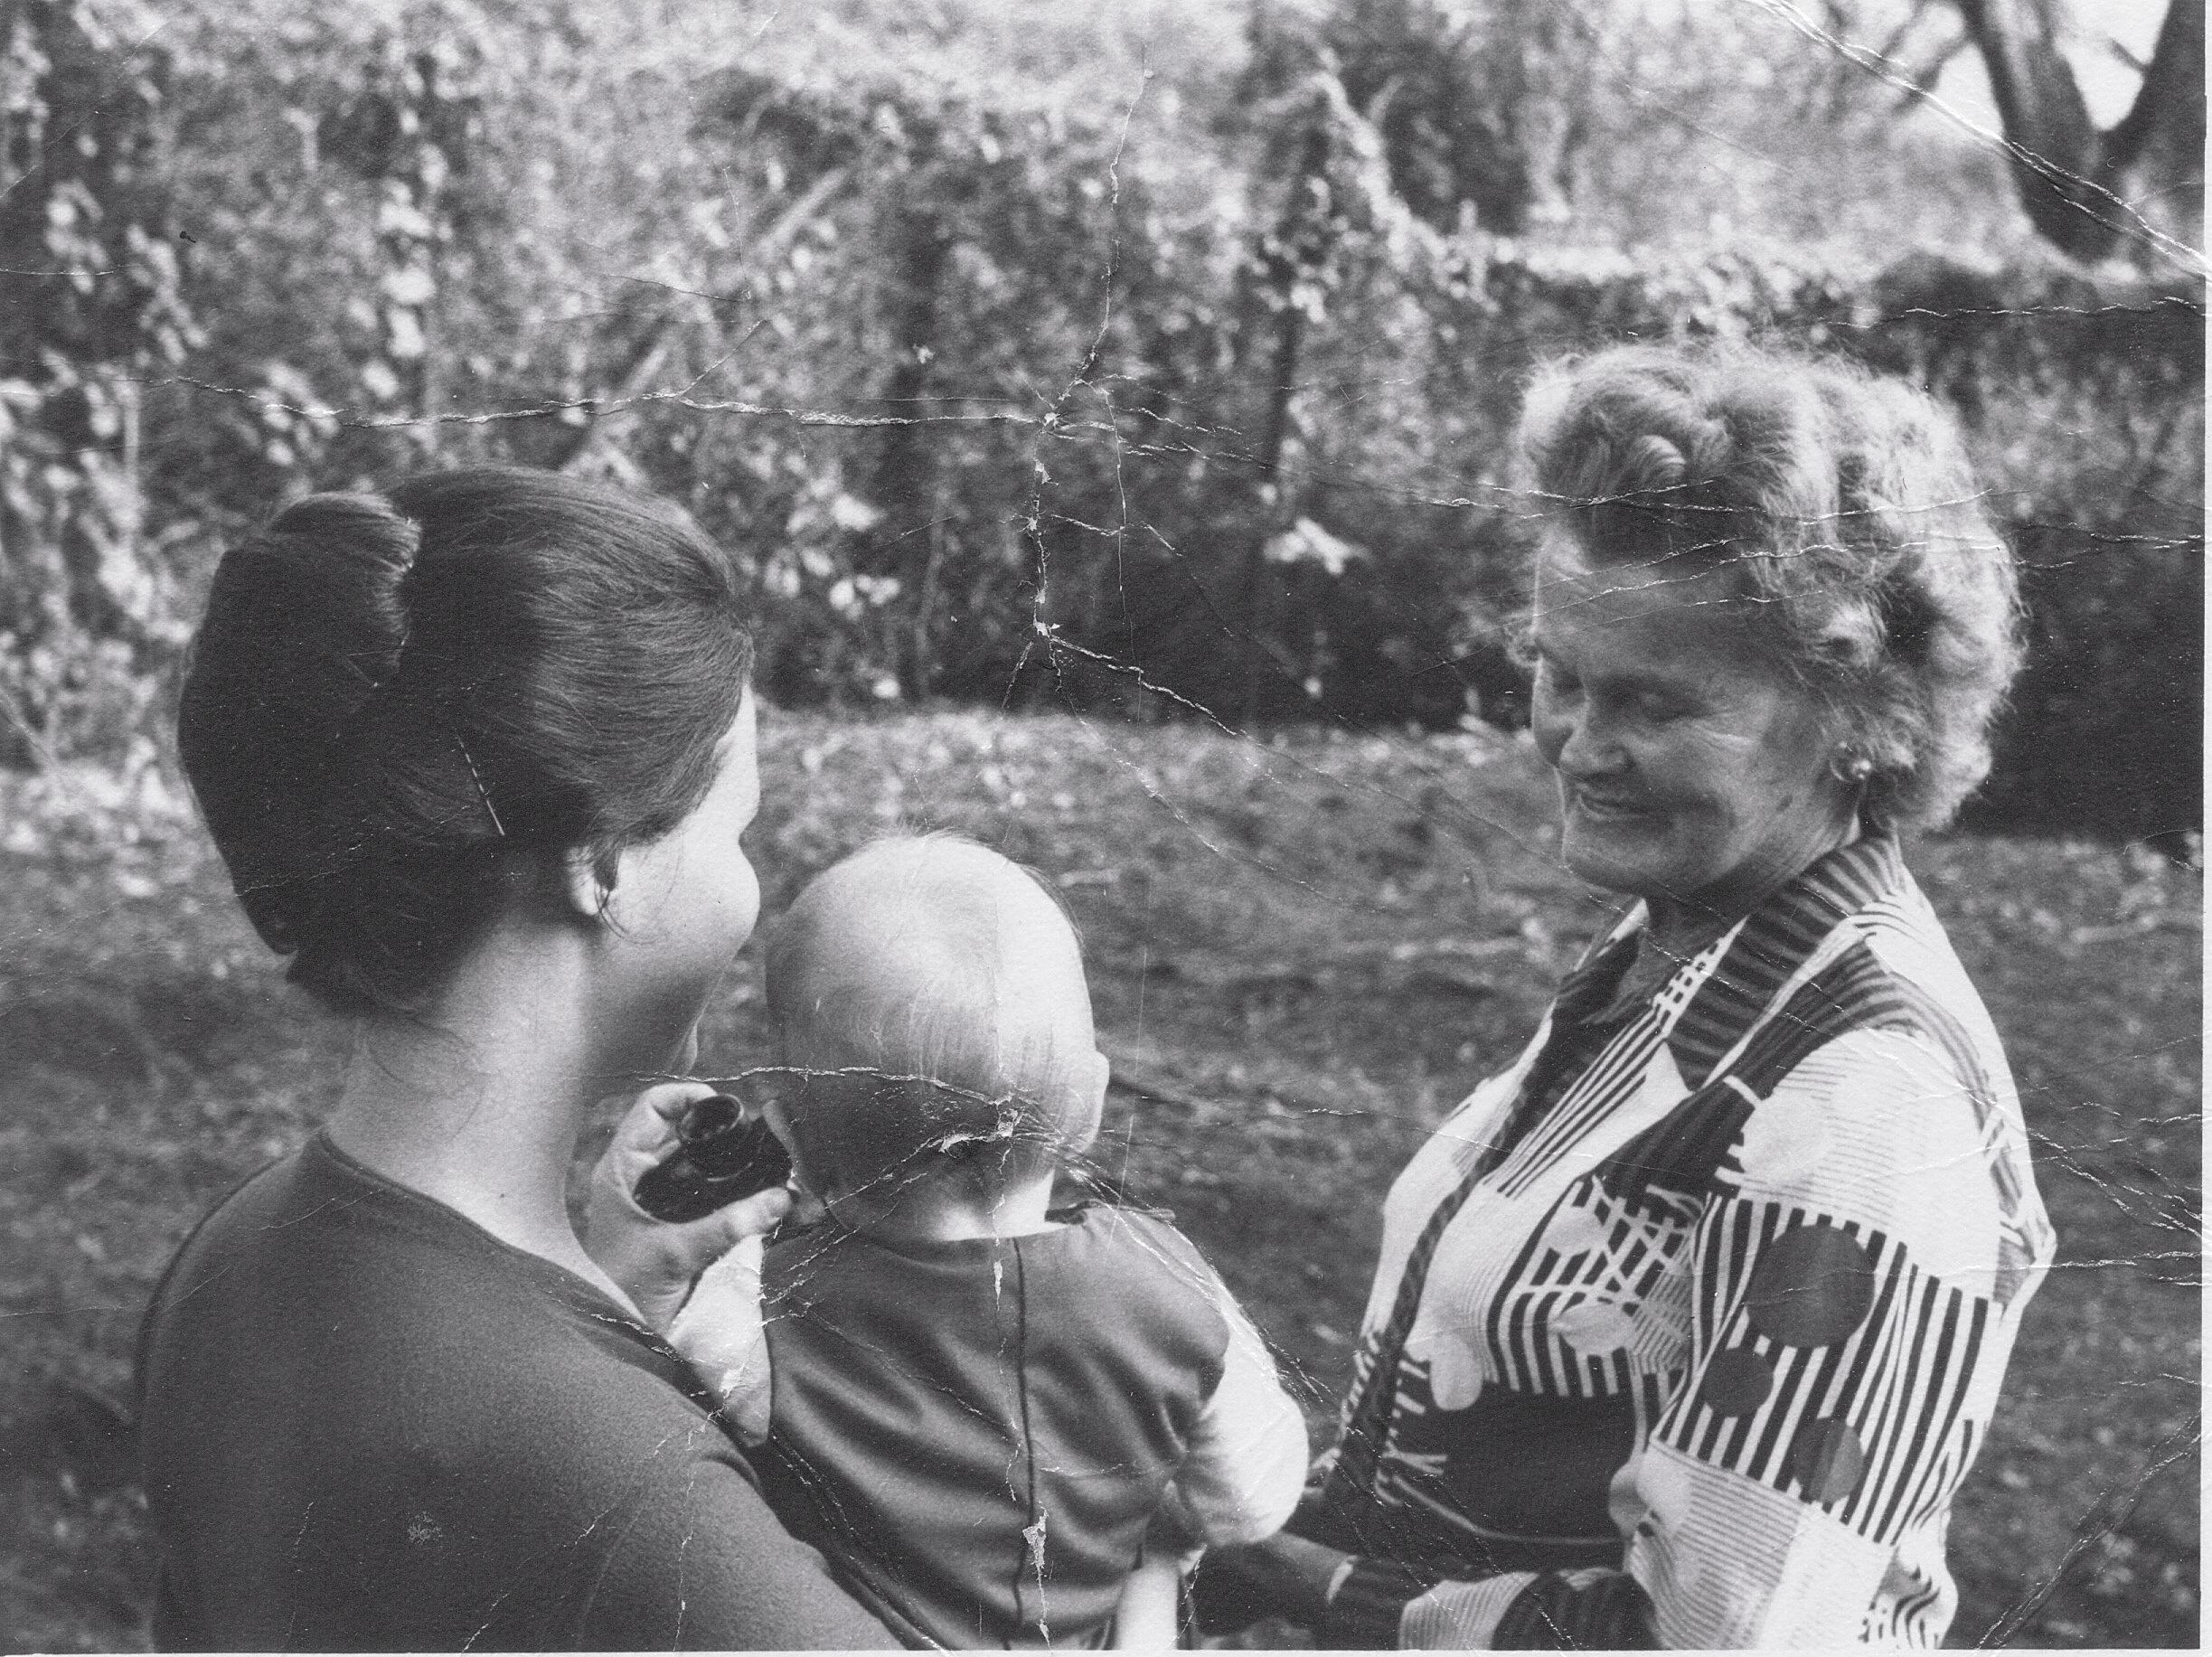 Donanne, Pauly and Joy Adamson at Elsamere